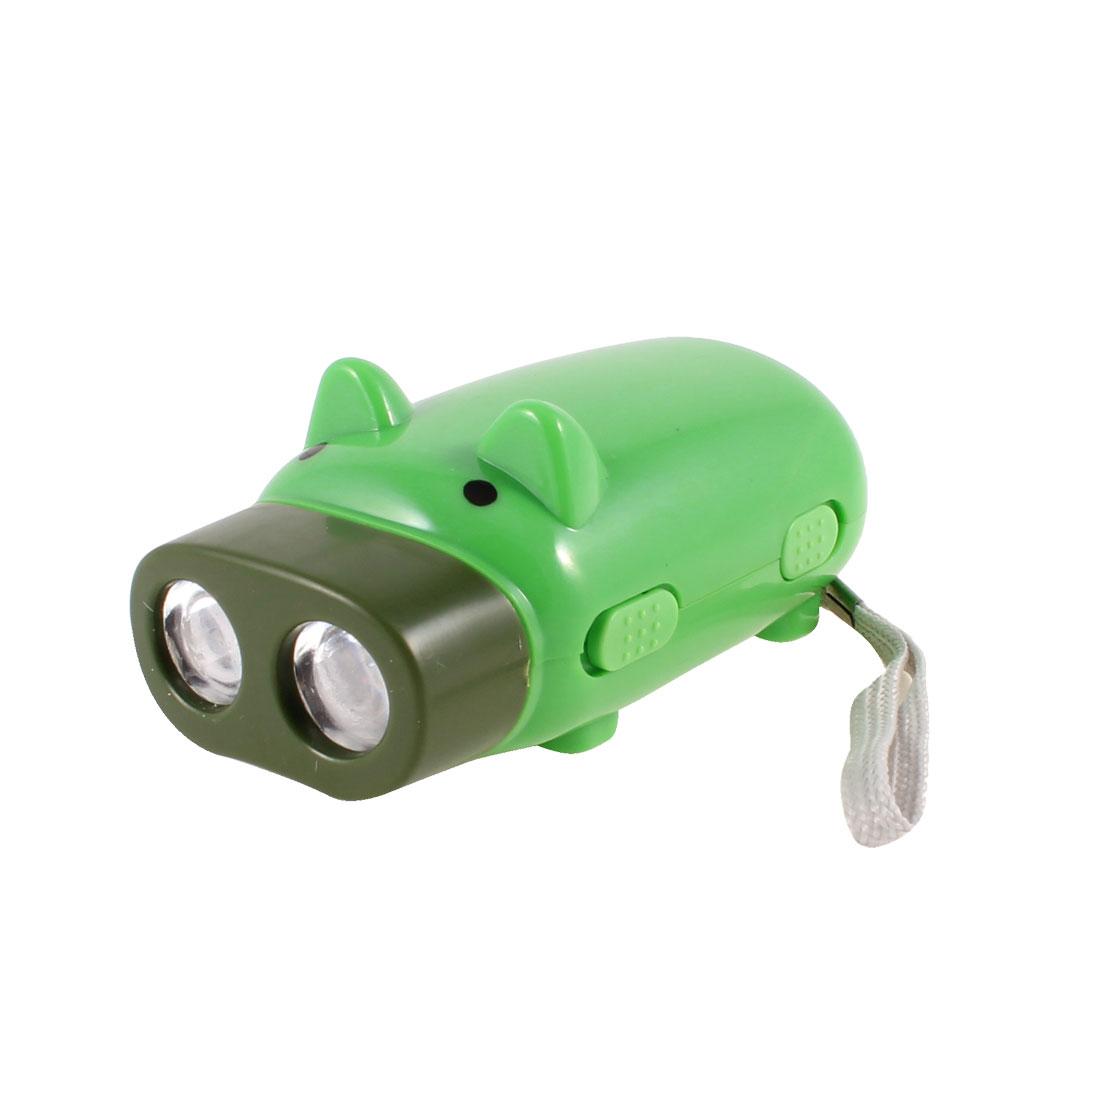 Green Cartoon Pig Shaped Energy Saving 2 LEDs Hand Pressing Flashlight Torch